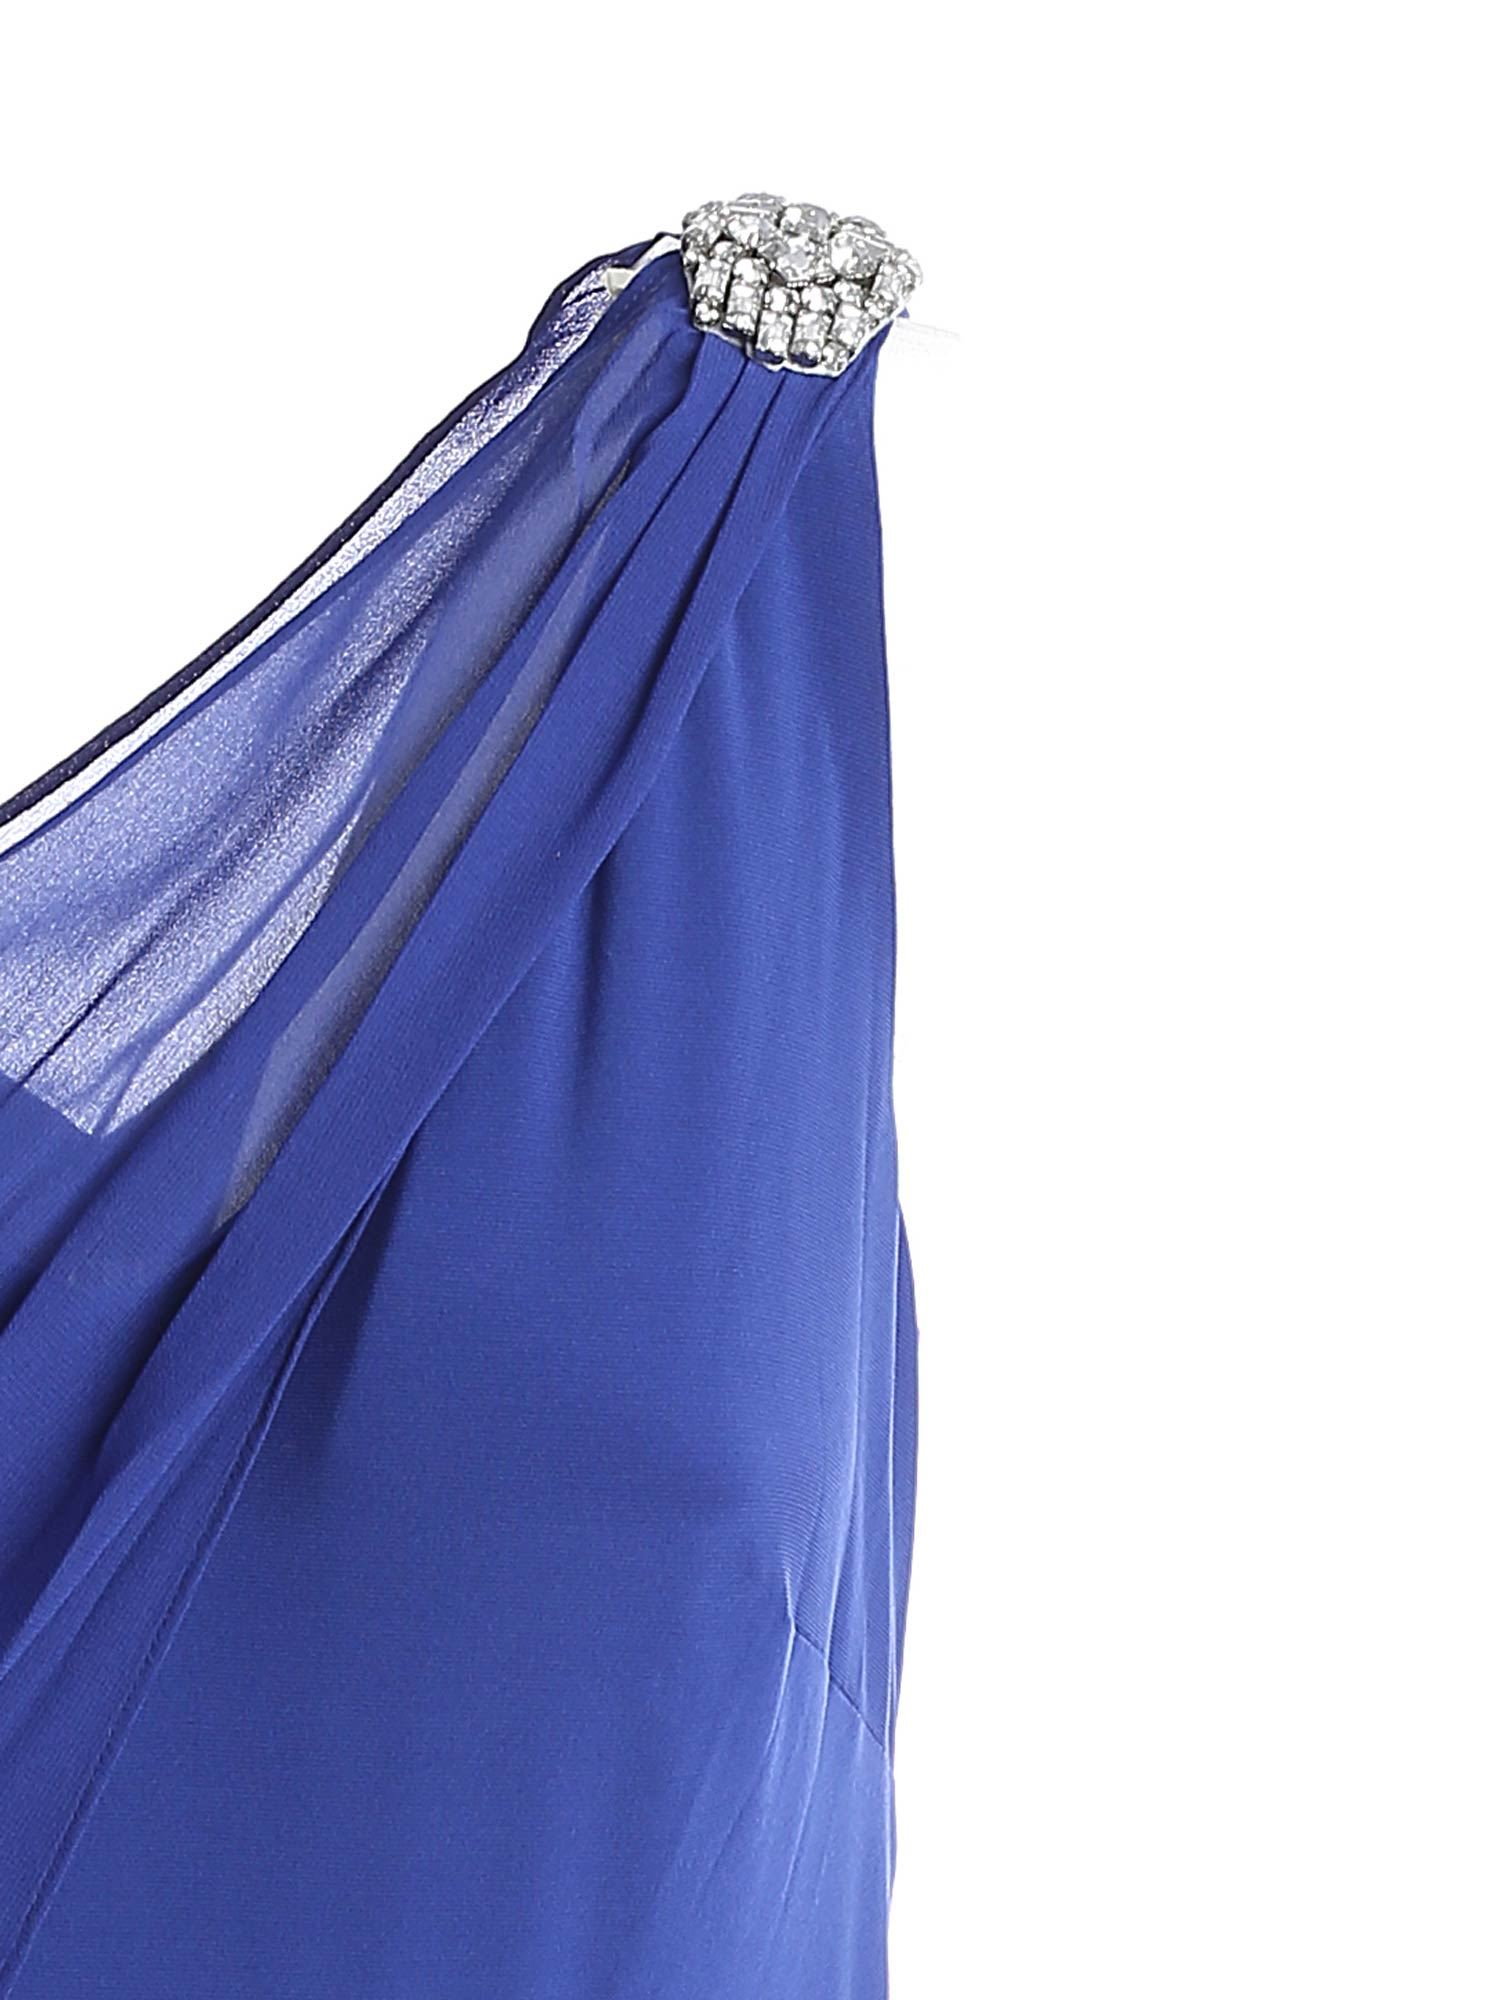 RHINESTONE DETAIL LONG DRESS IN BLUE POLO RALPH LAUREN   11   253830084002